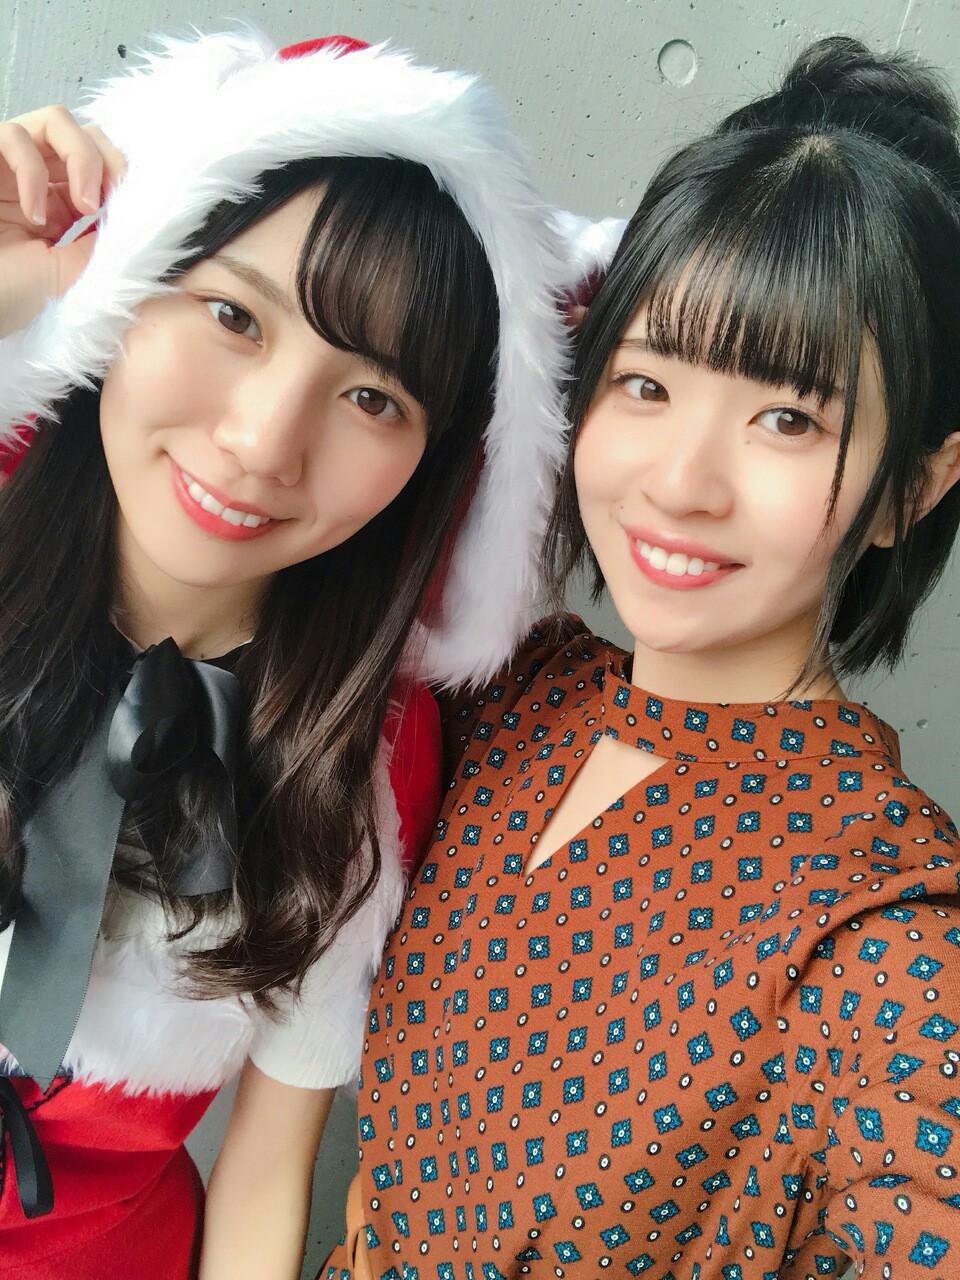 f:id:asitaha46:20181121004156j:image